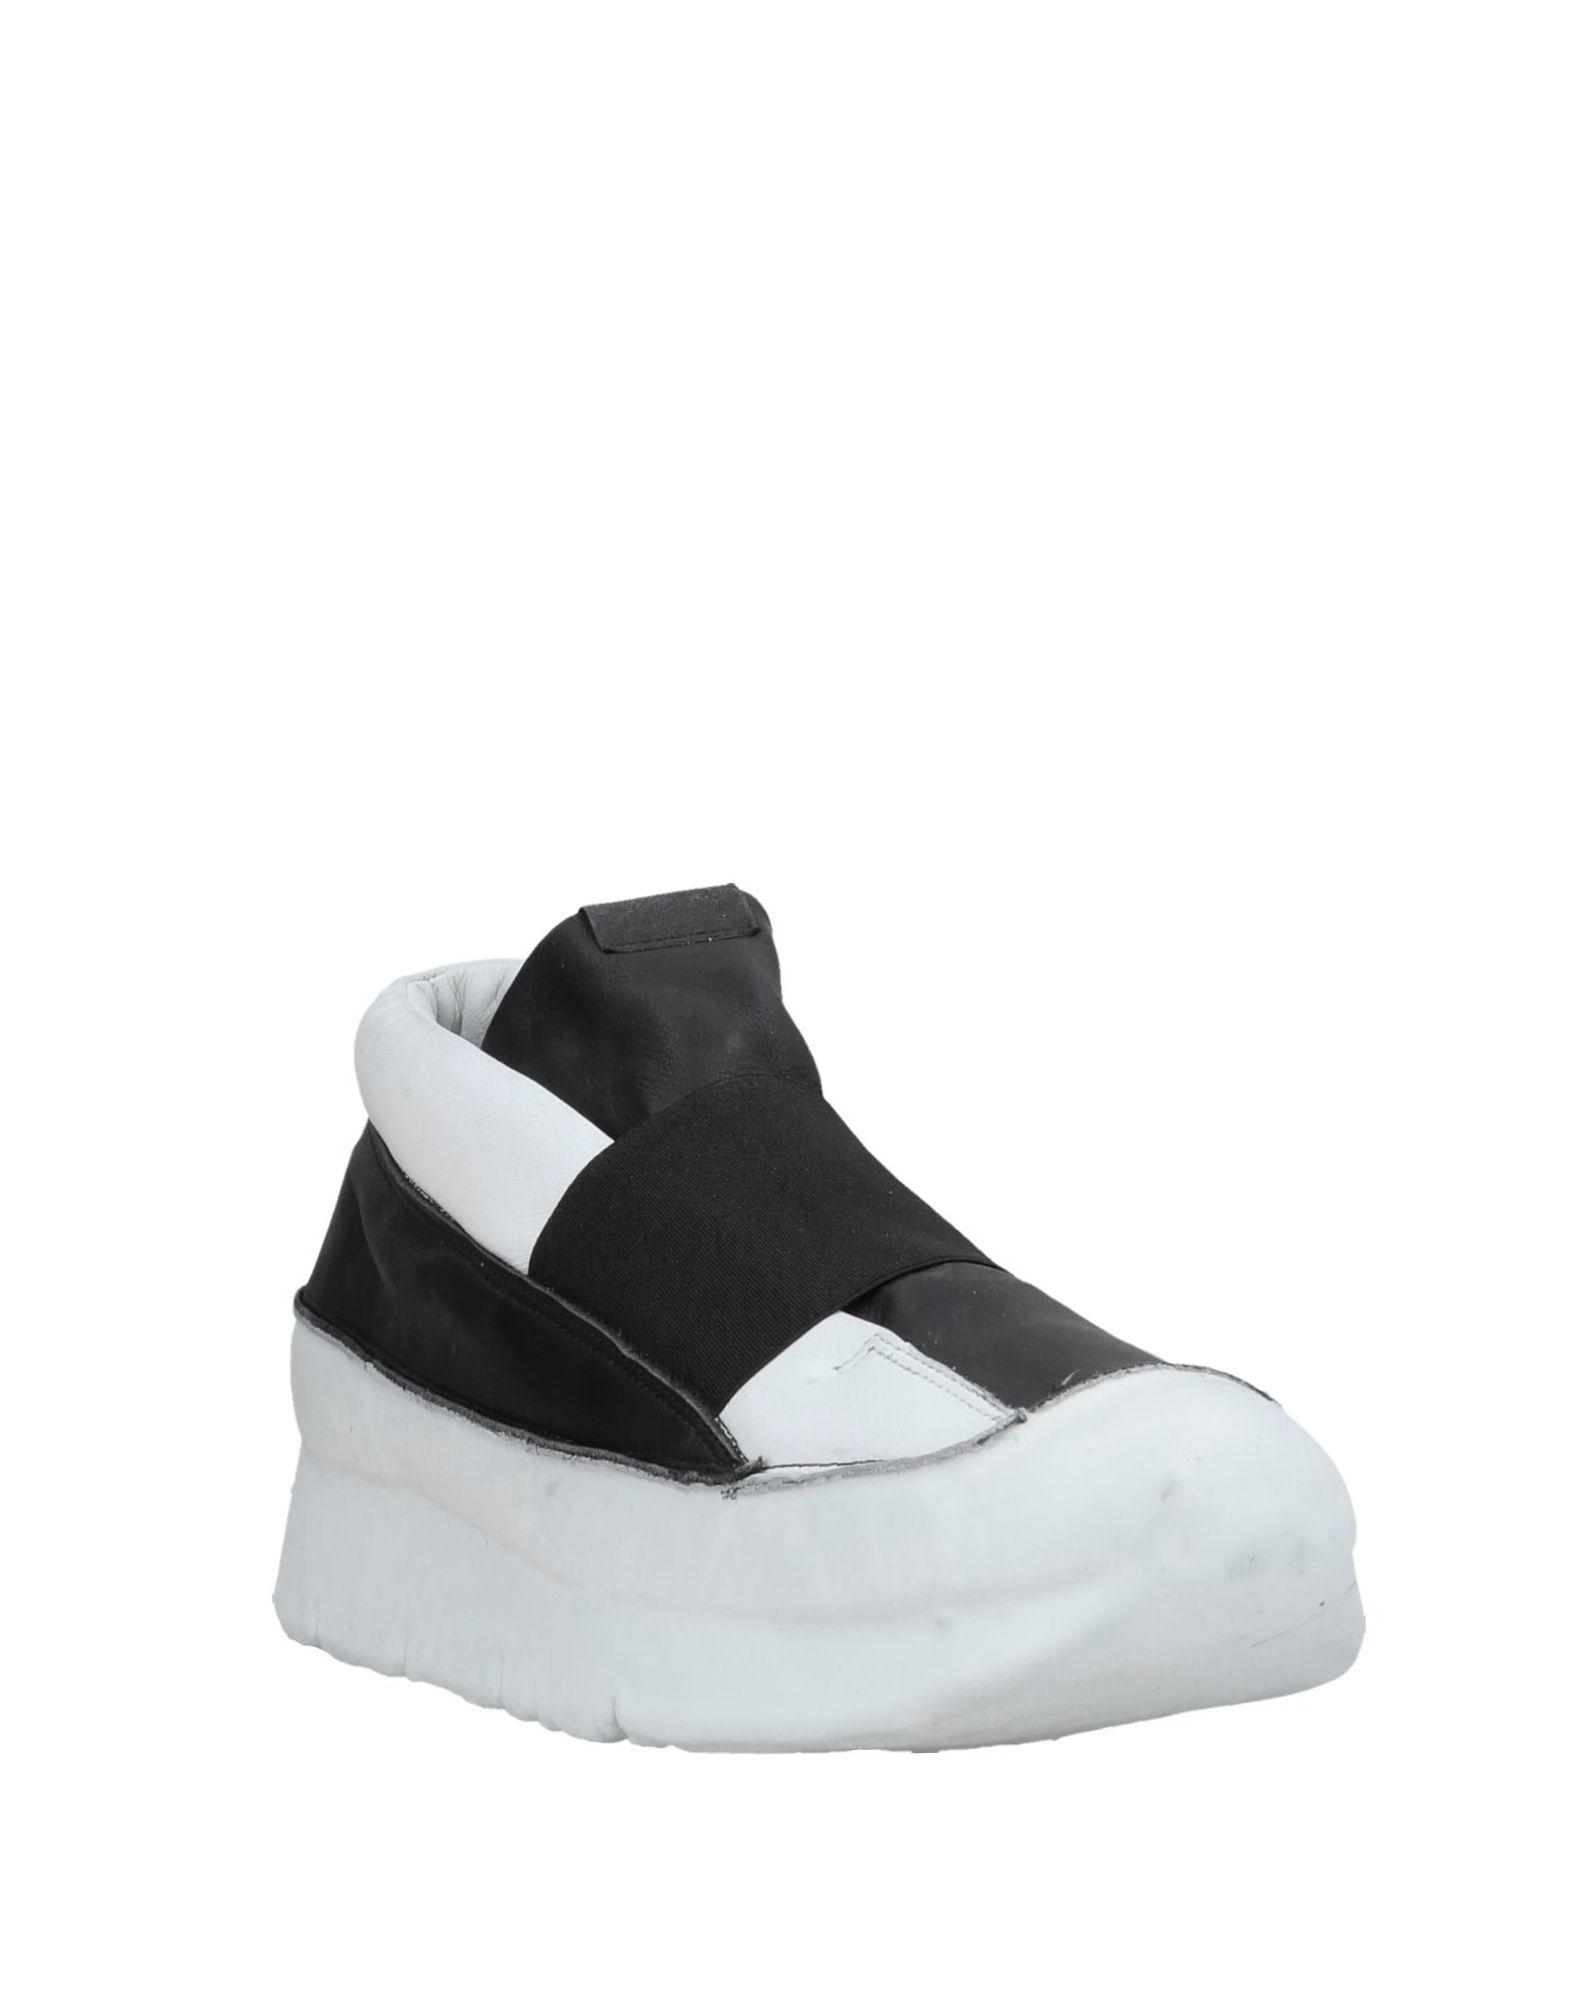 Rubber Soul Sneakers Herren beliebte  11554941JW Gute Qualität beliebte Herren Schuhe e94a2c